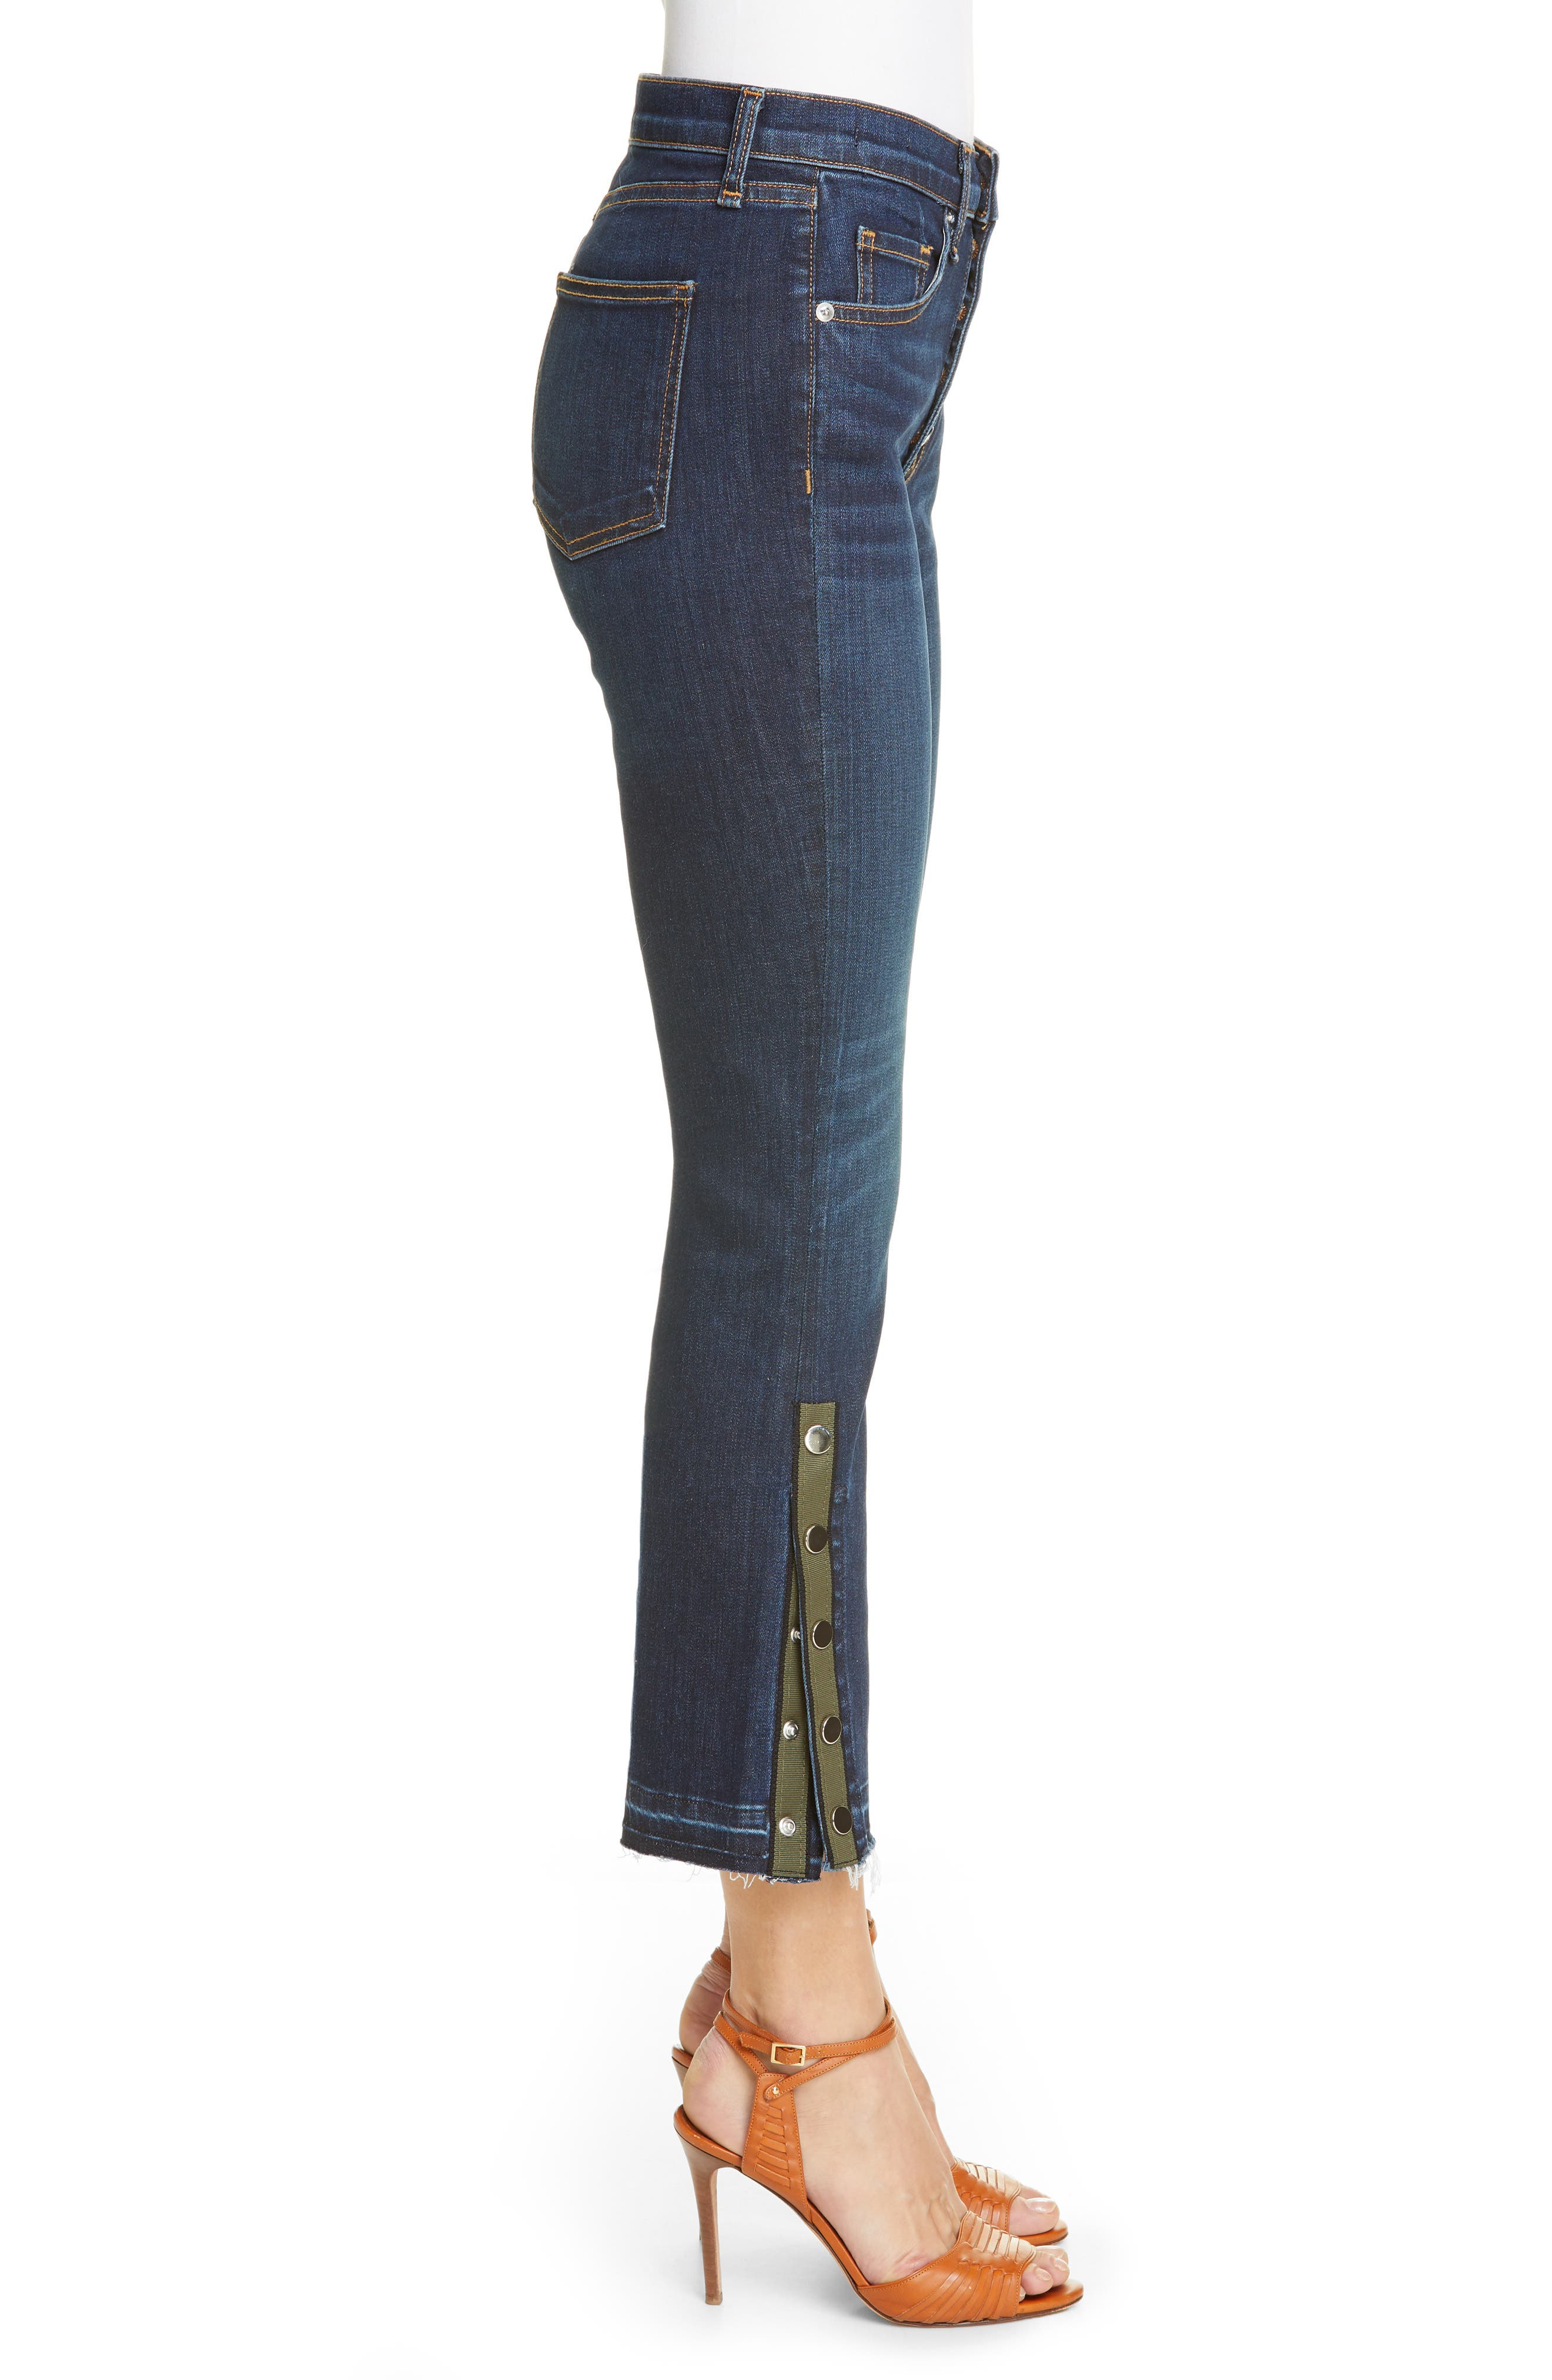 VERONICA BEARD, Carolyn Side Vent Baby Boot Jeans, Alternate thumbnail 4, color, DARK VINTAGE